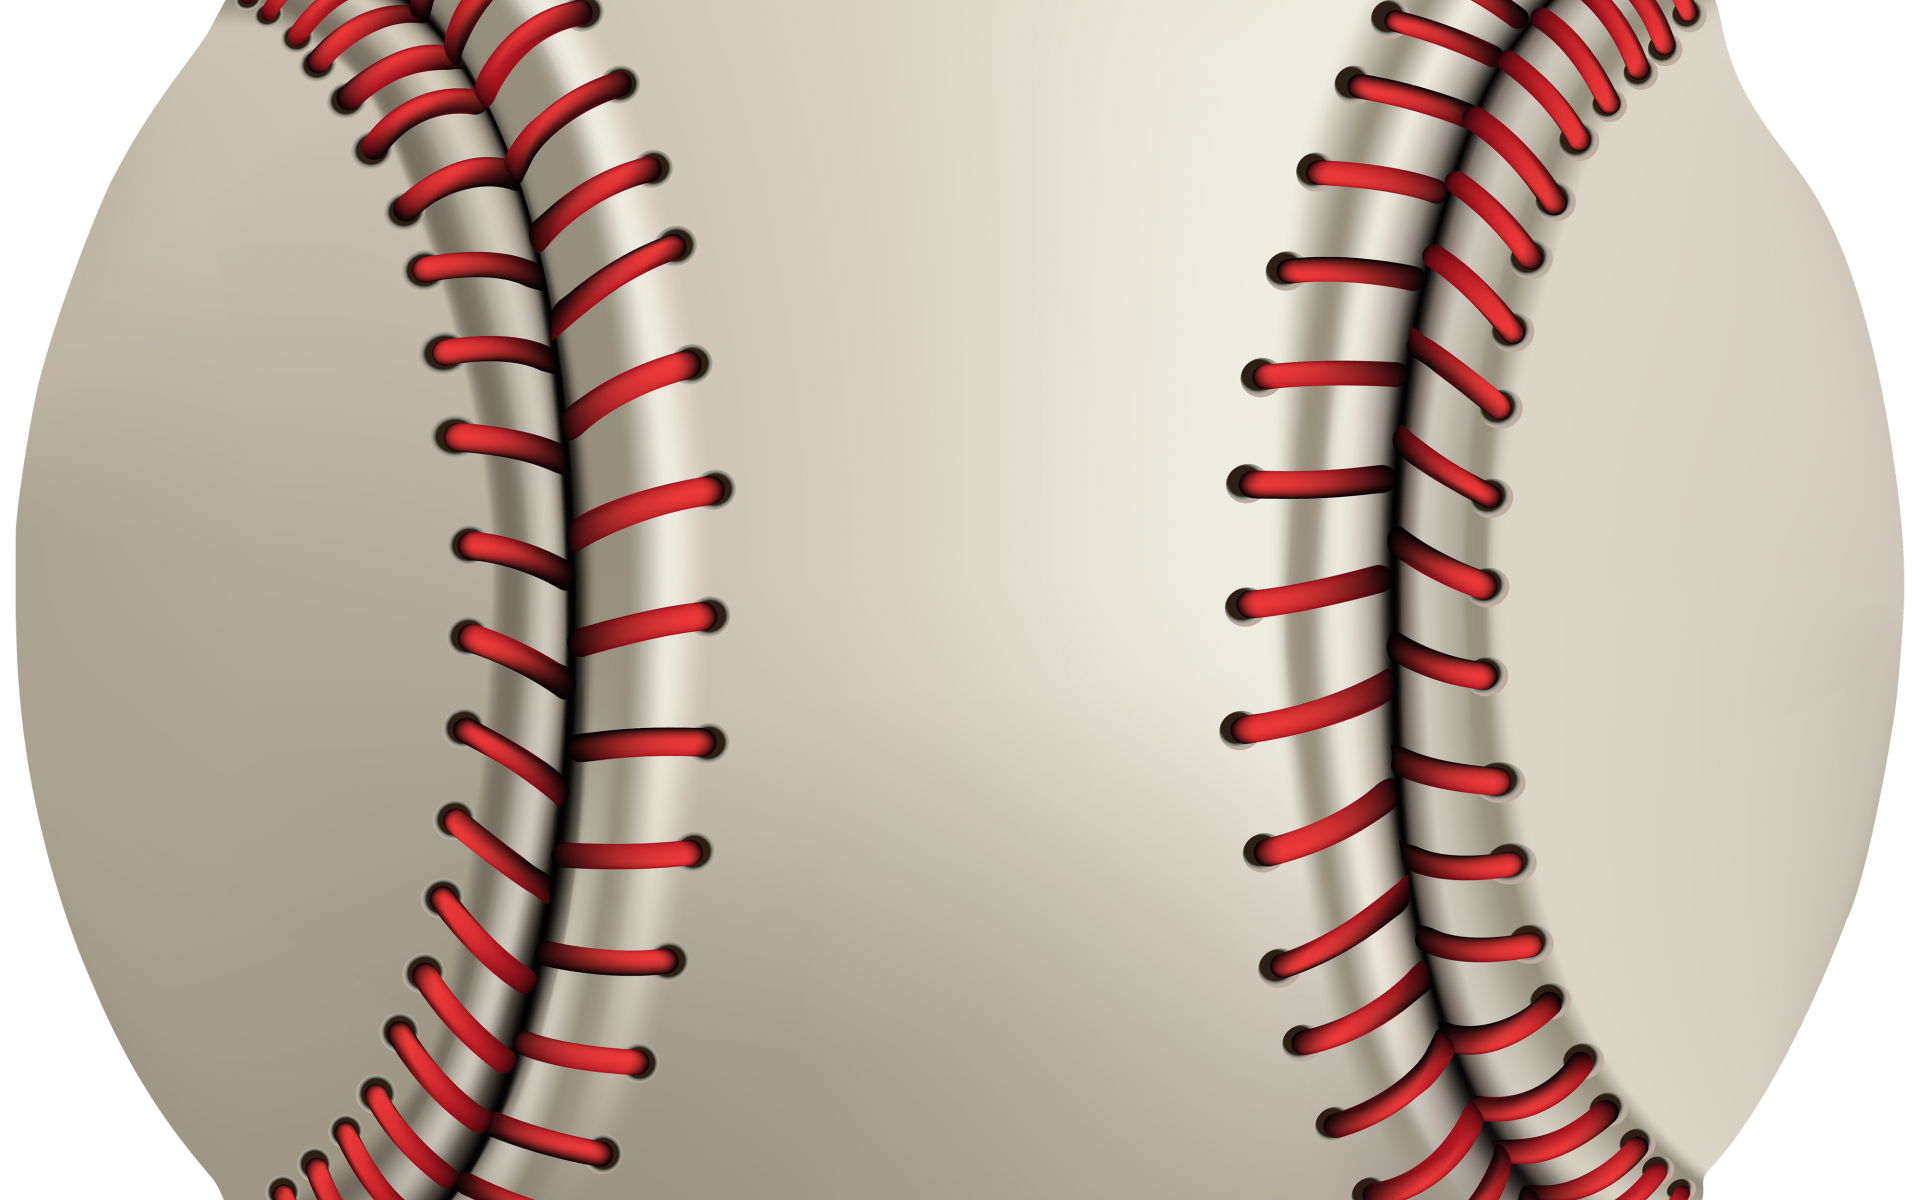 Baseball word clipart svg black and white download Flaming Baseball Cliparts 25 - 4000 X 3995 | carwad.net svg black and white download